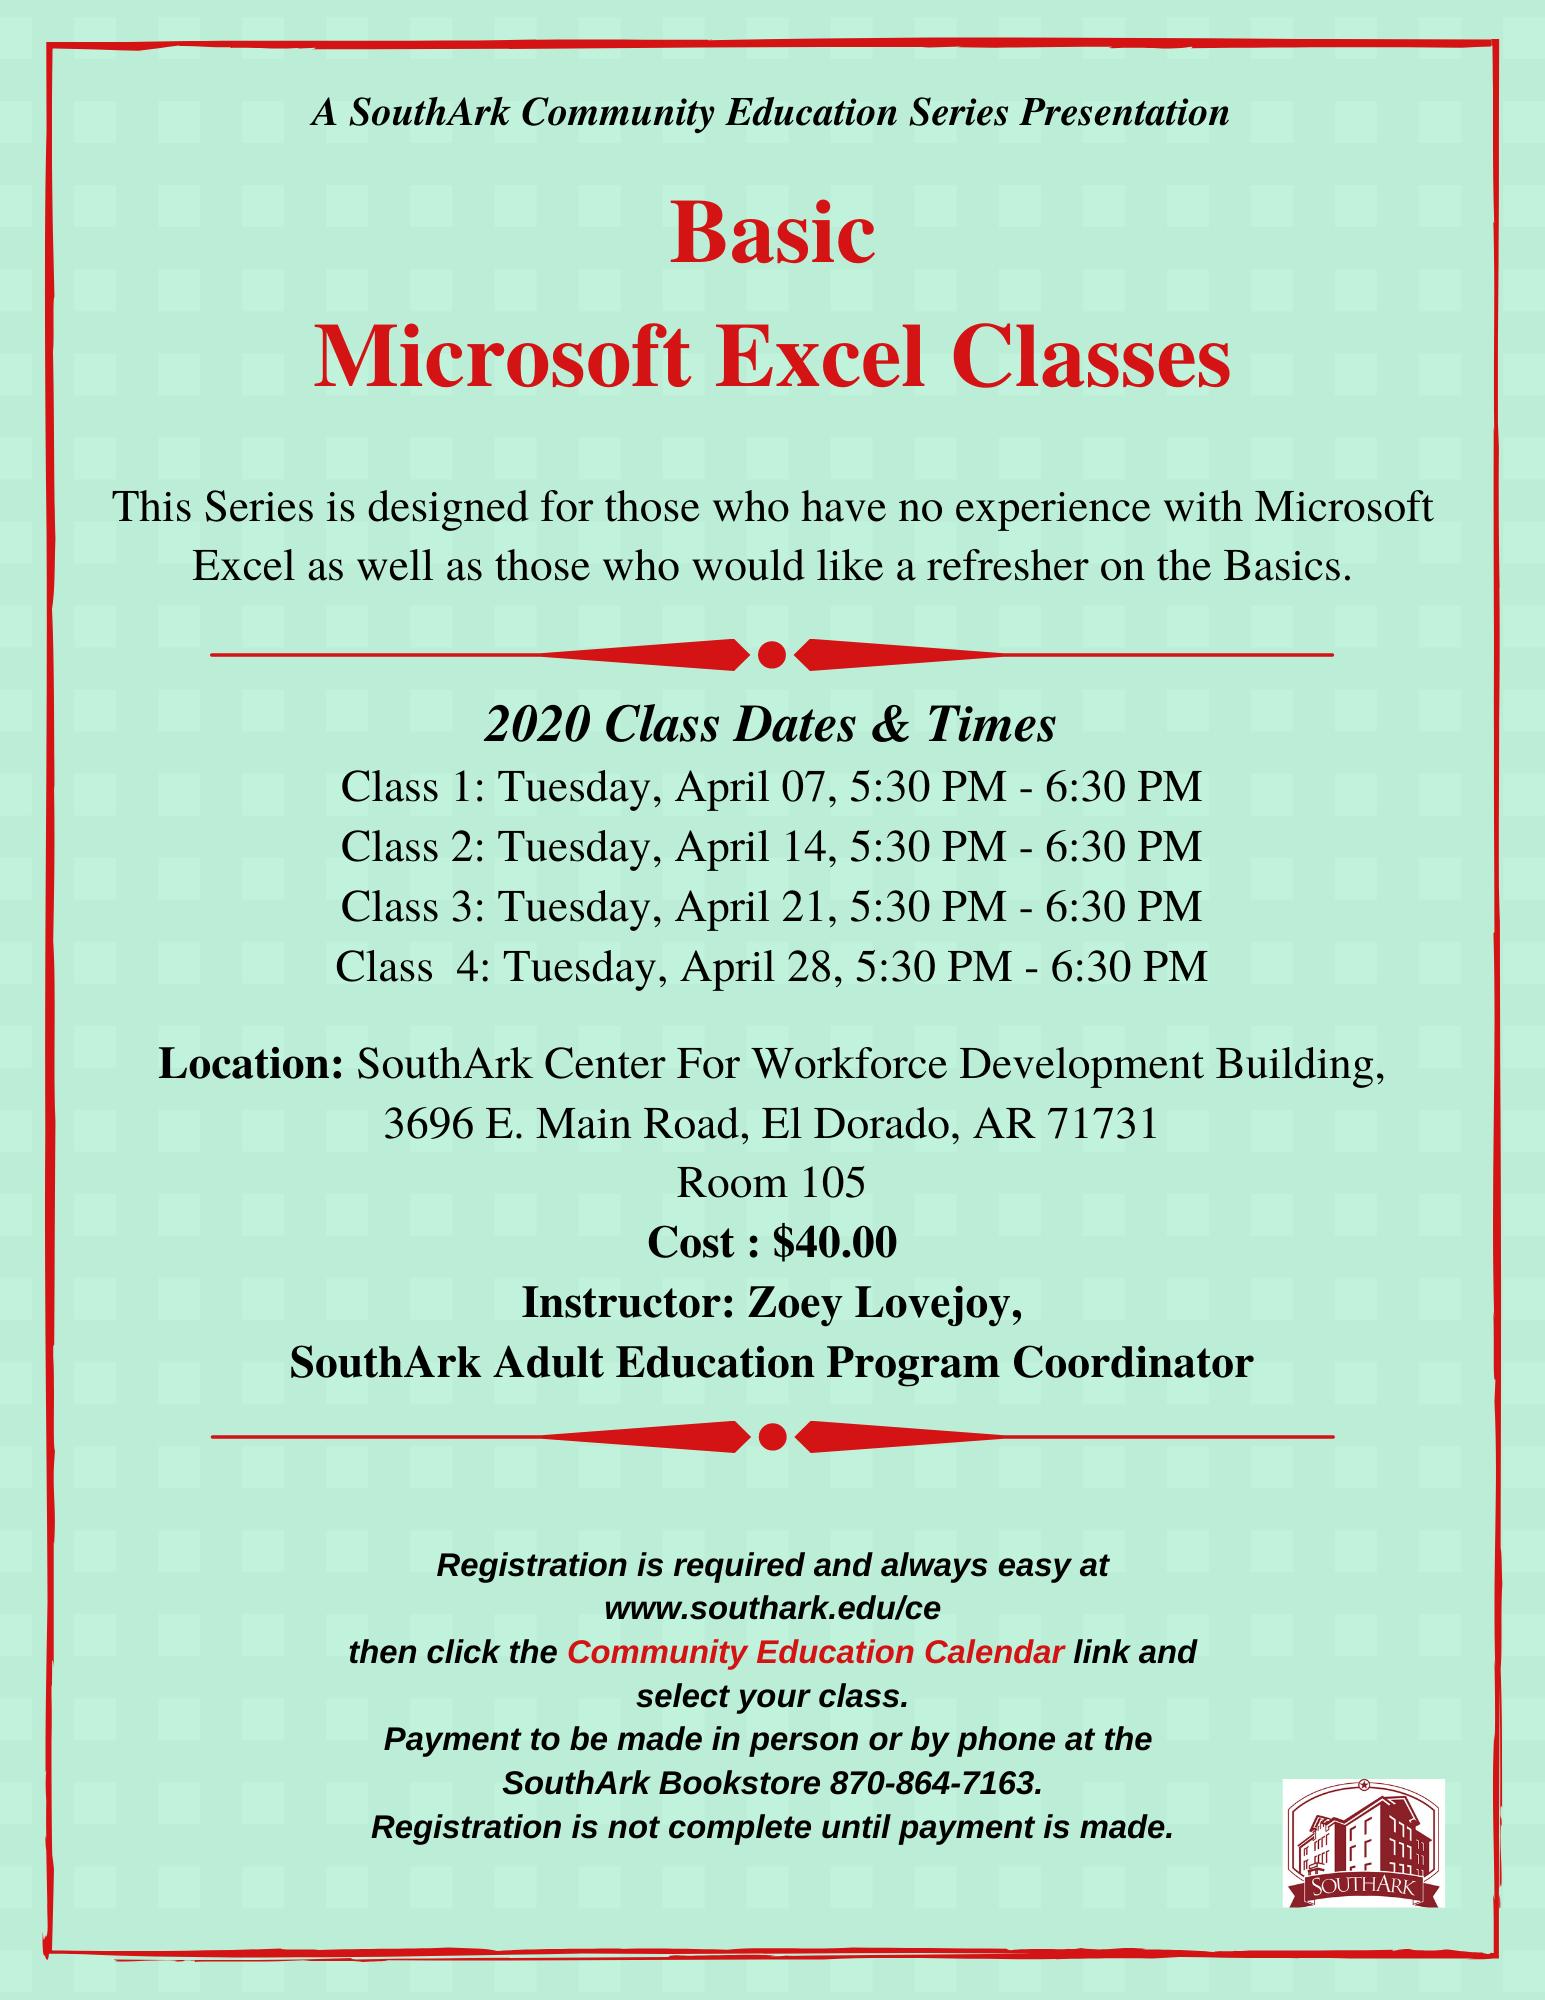 POSTPONED: Basic Microsoft Excel Classes